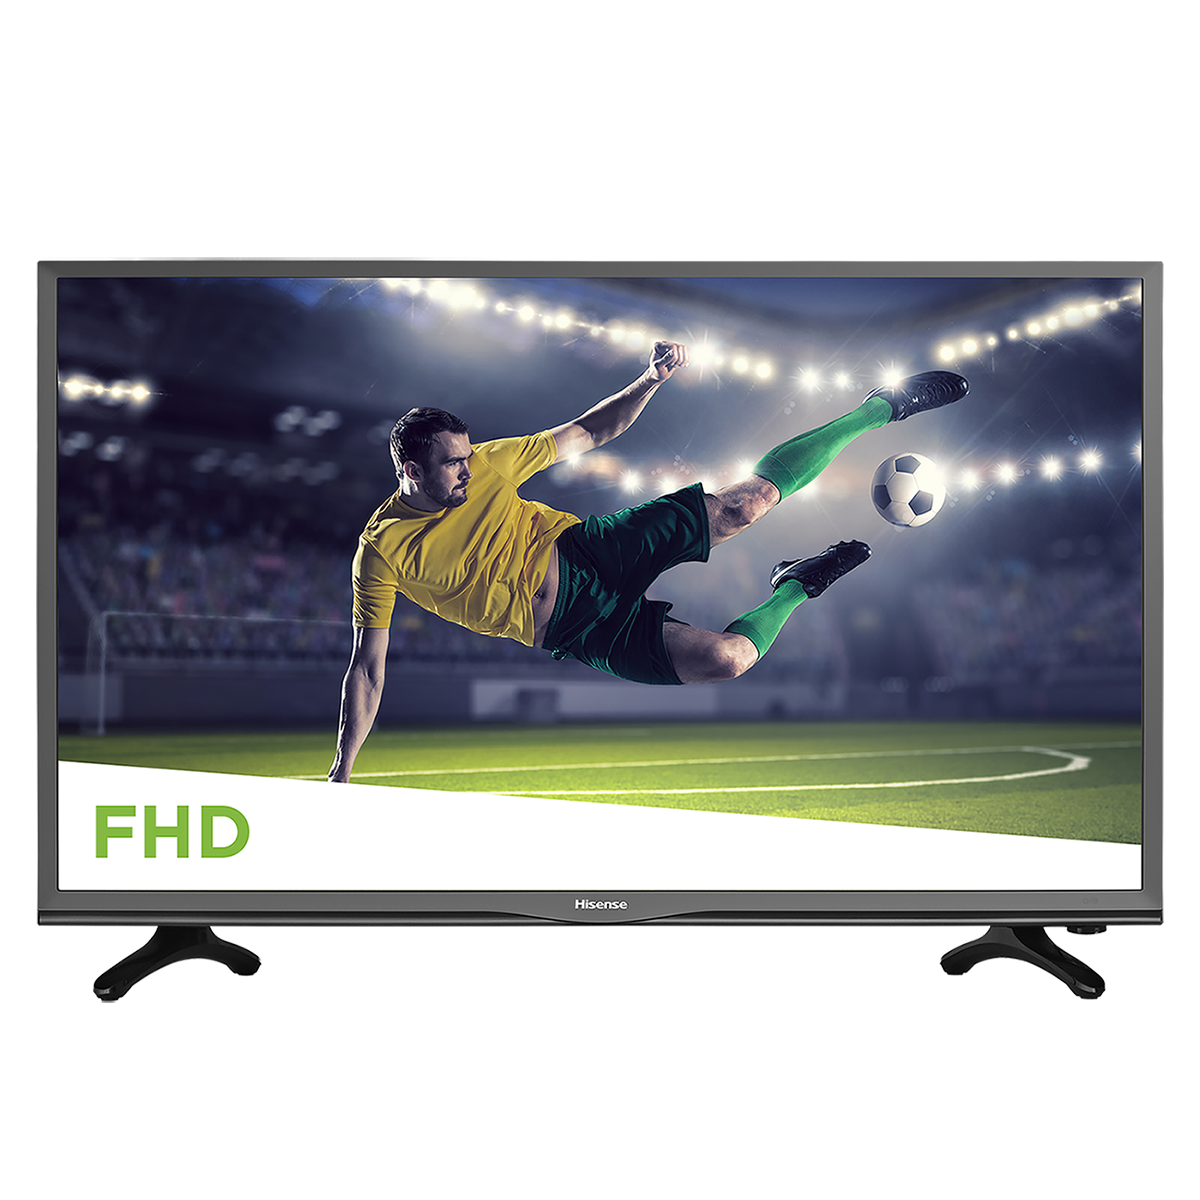 "Hisense 40"" Class FHD (1080P) LED TV (40EU3000)"